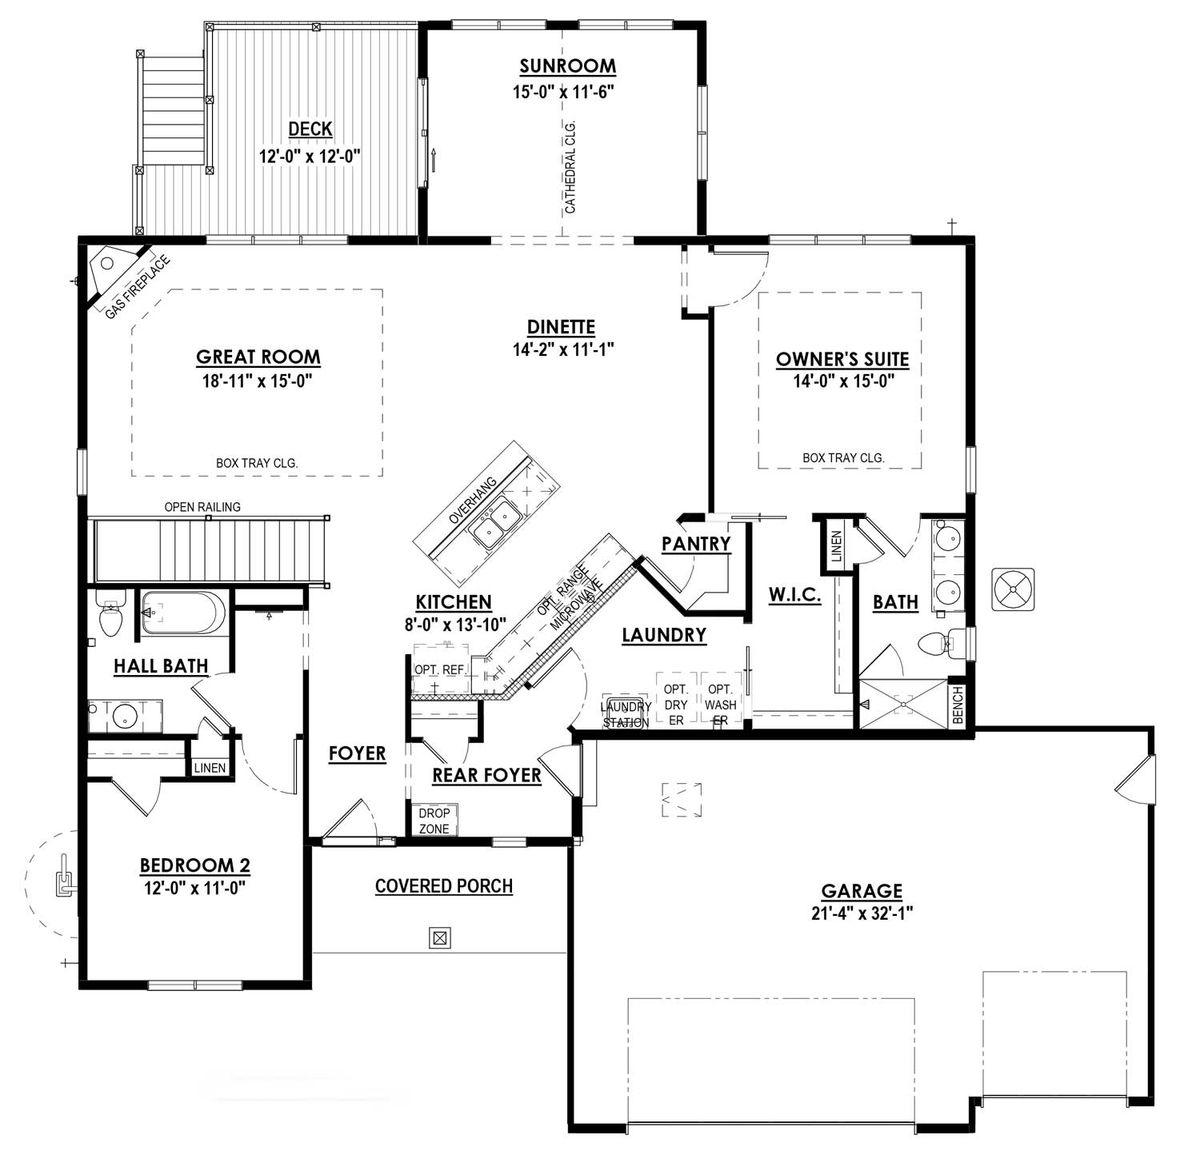 1370 Panorama Court Floorplan